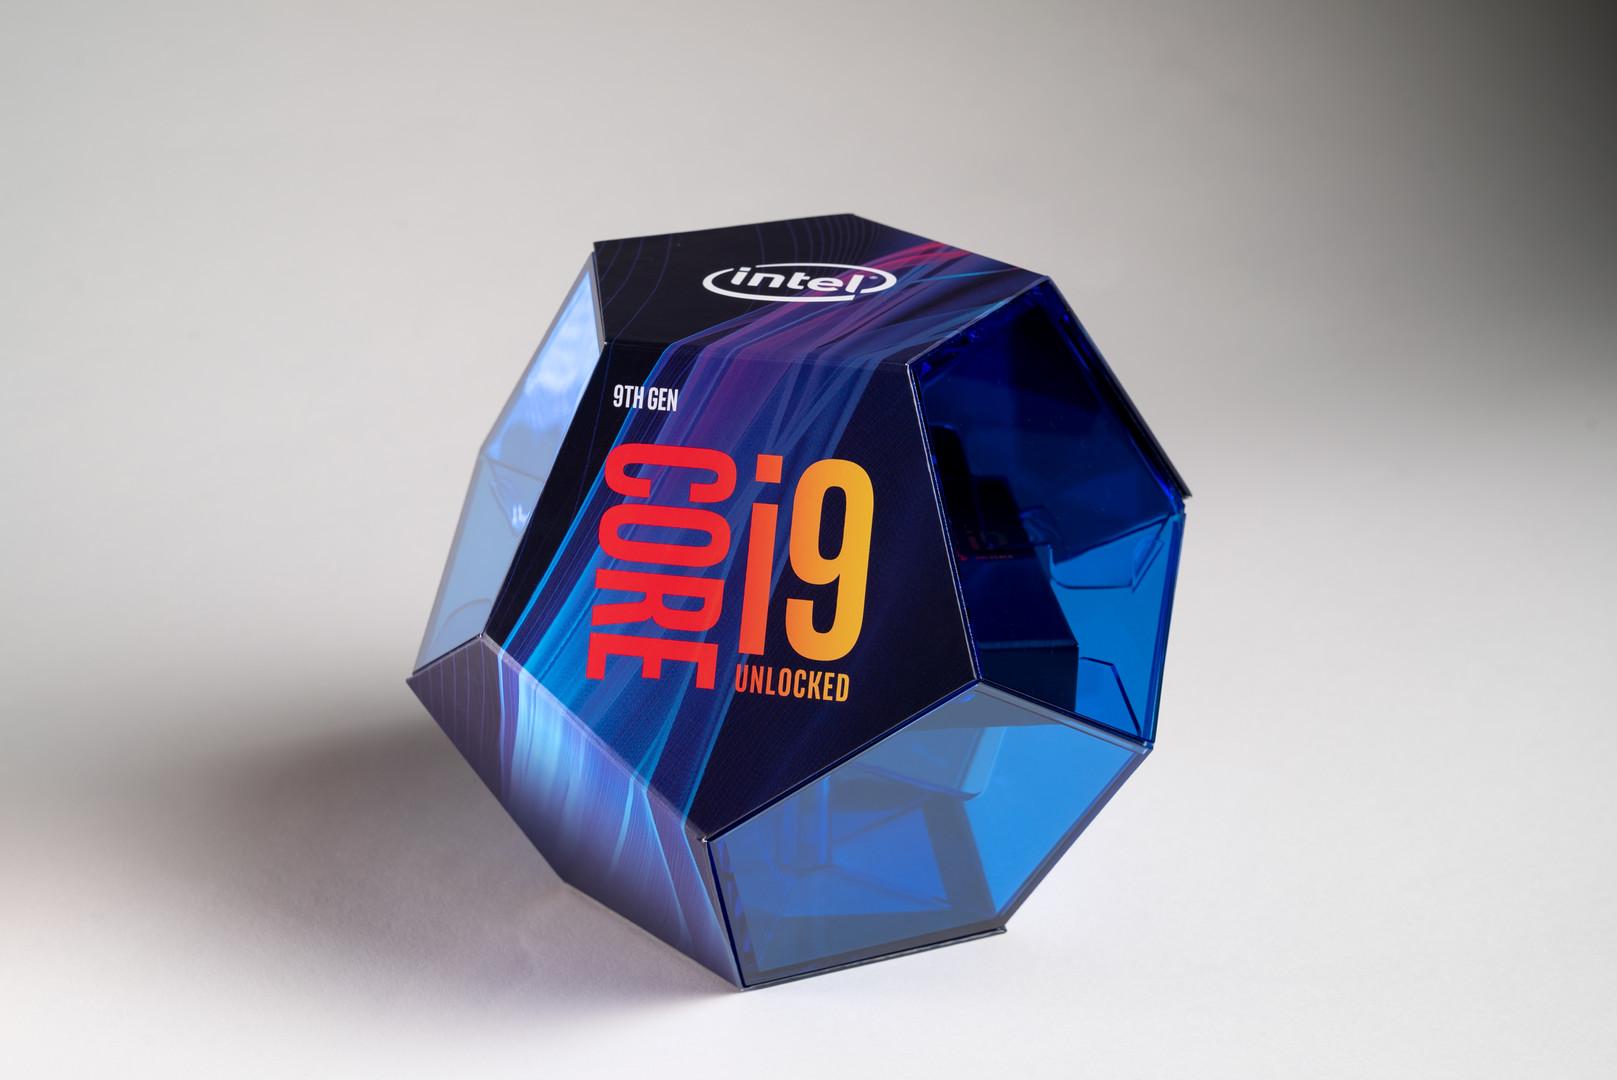 Intel Core i9-9900K (8 cores, 16 threads, 3 6 GHz) Desktop